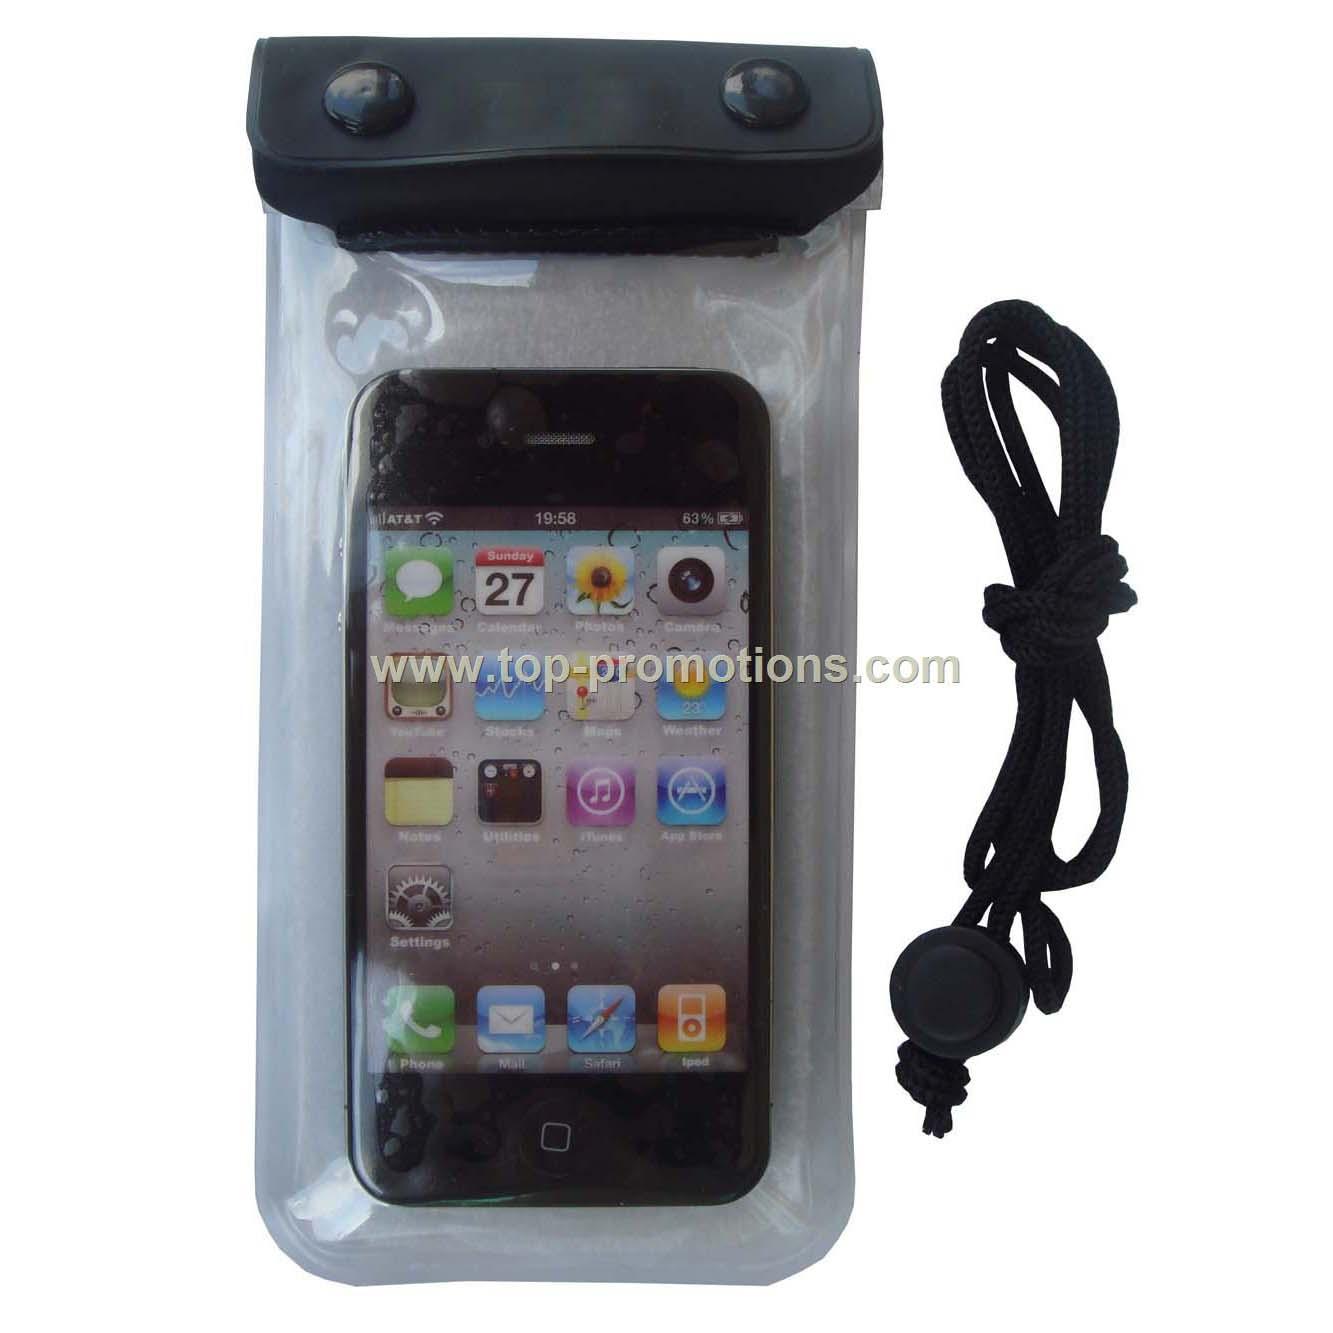 Waterproof cellphone bag